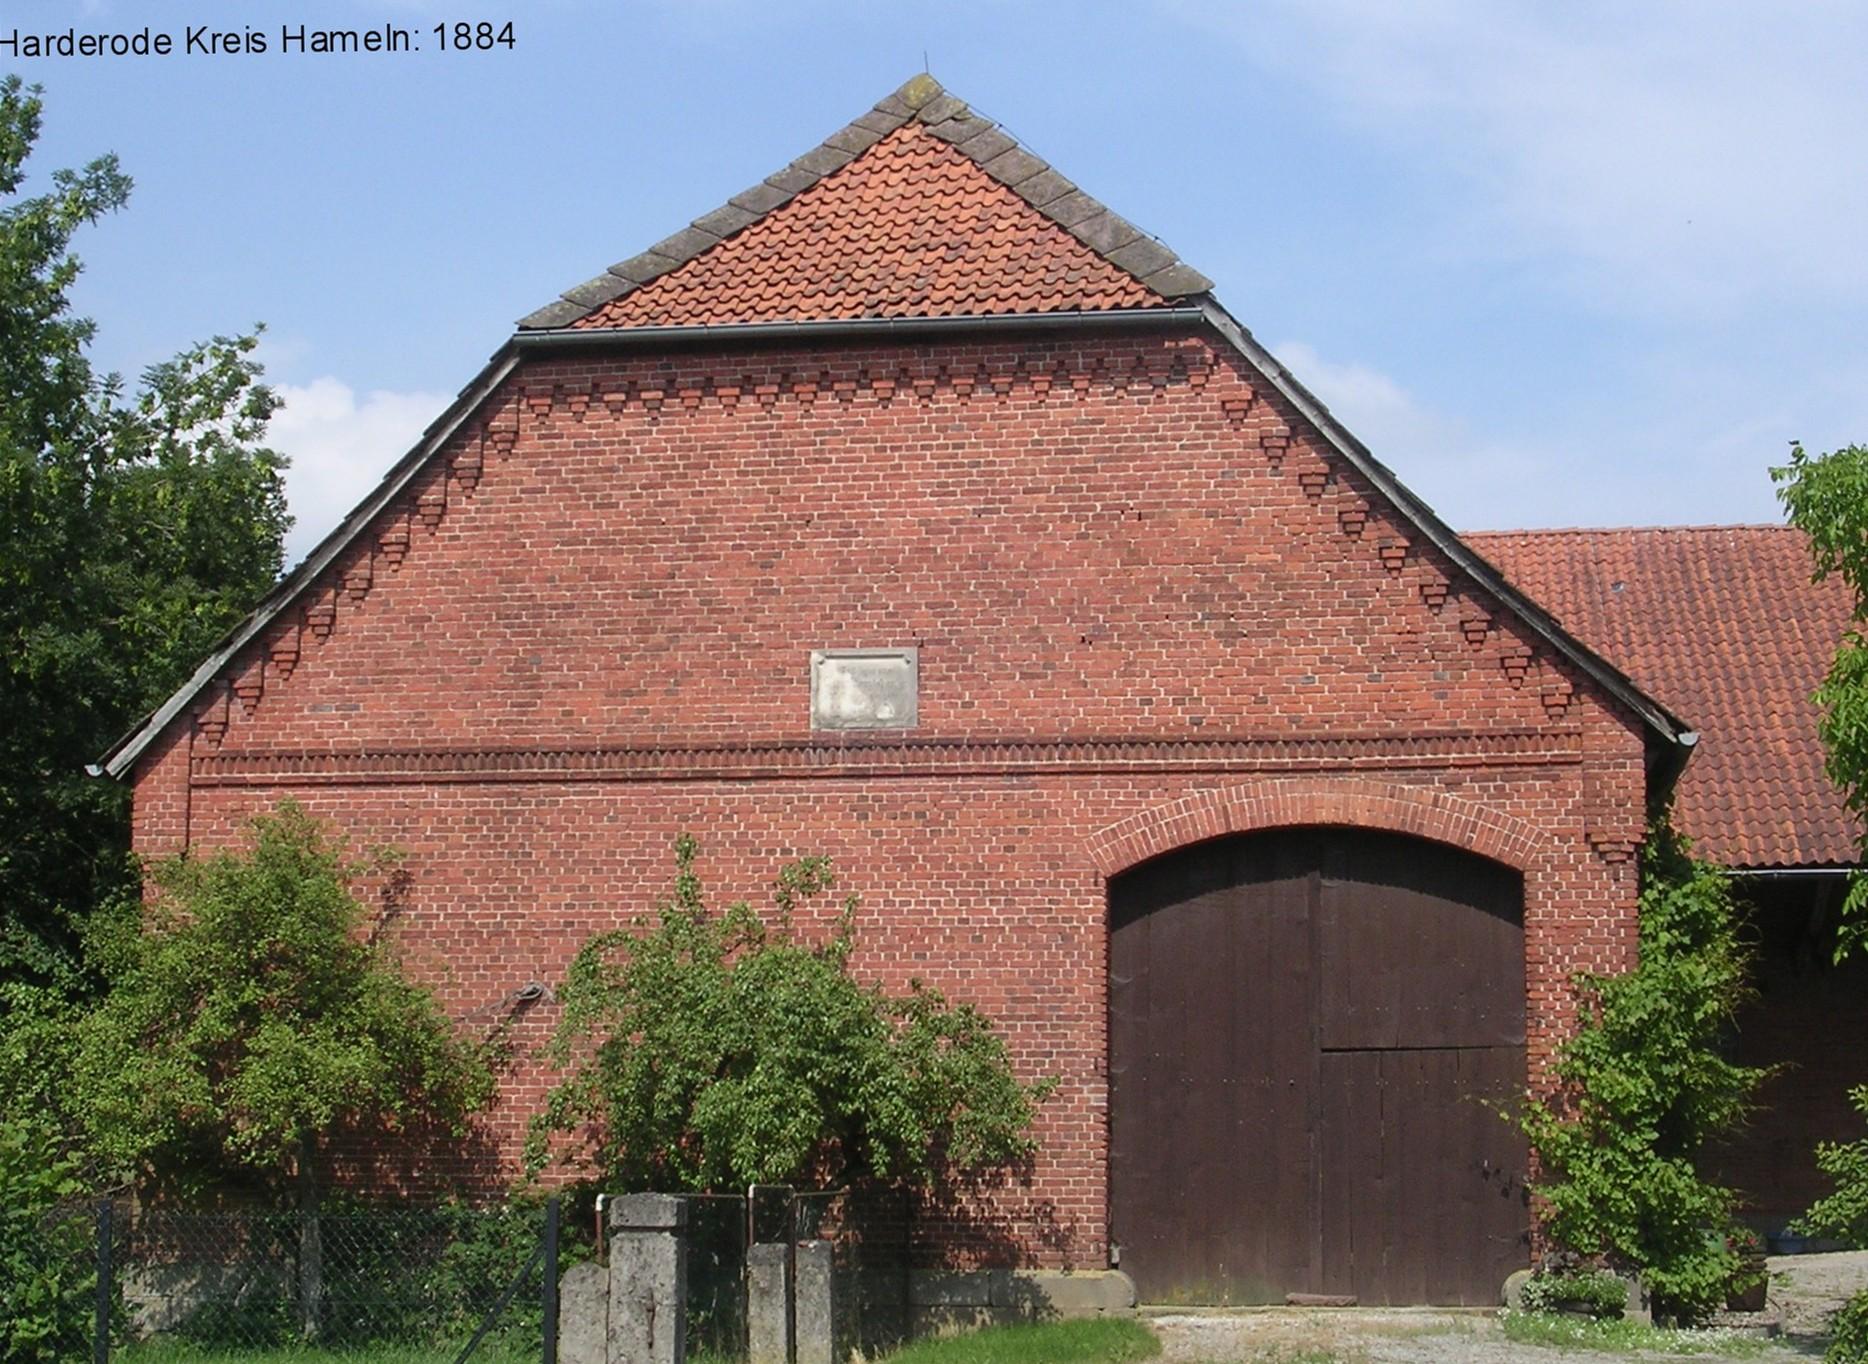 f-harderode-hm-1884